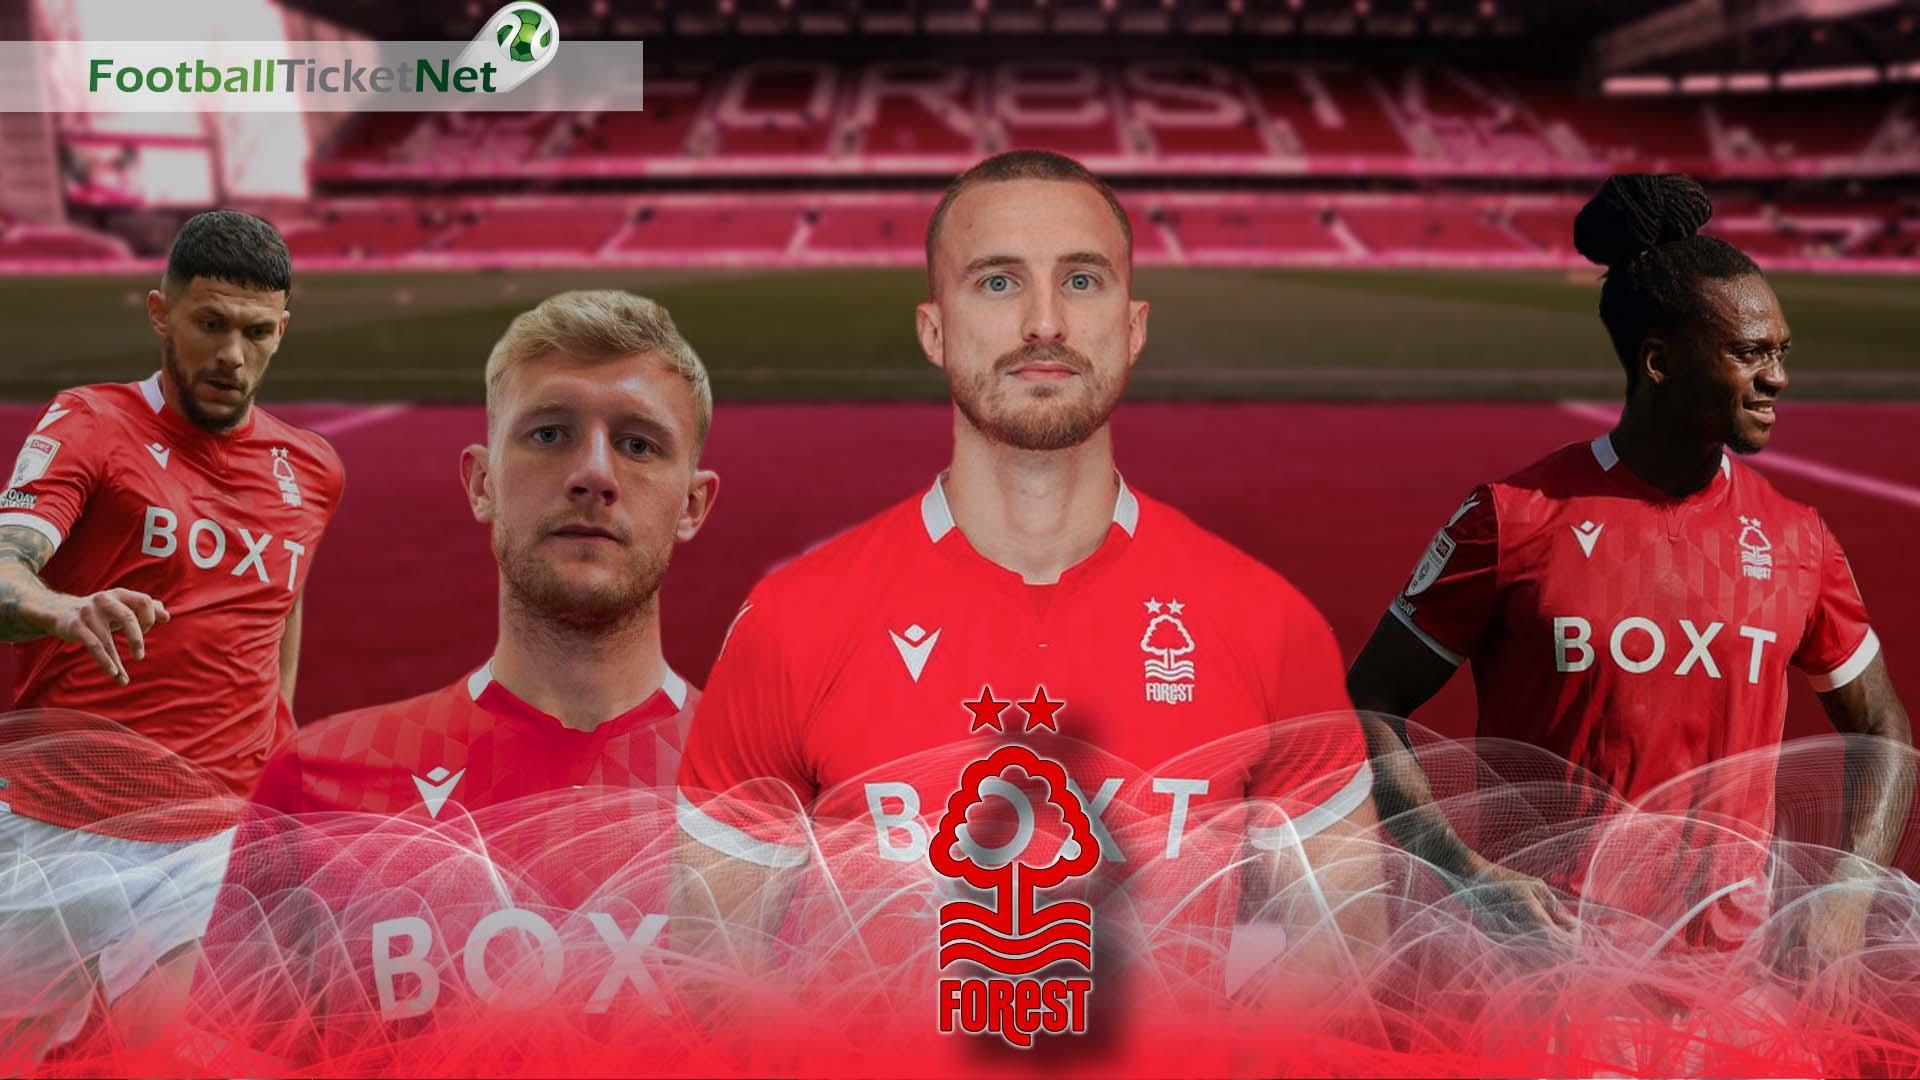 Buy Nottingham Forest Football Tickets 2019 20 Football Ticket Net